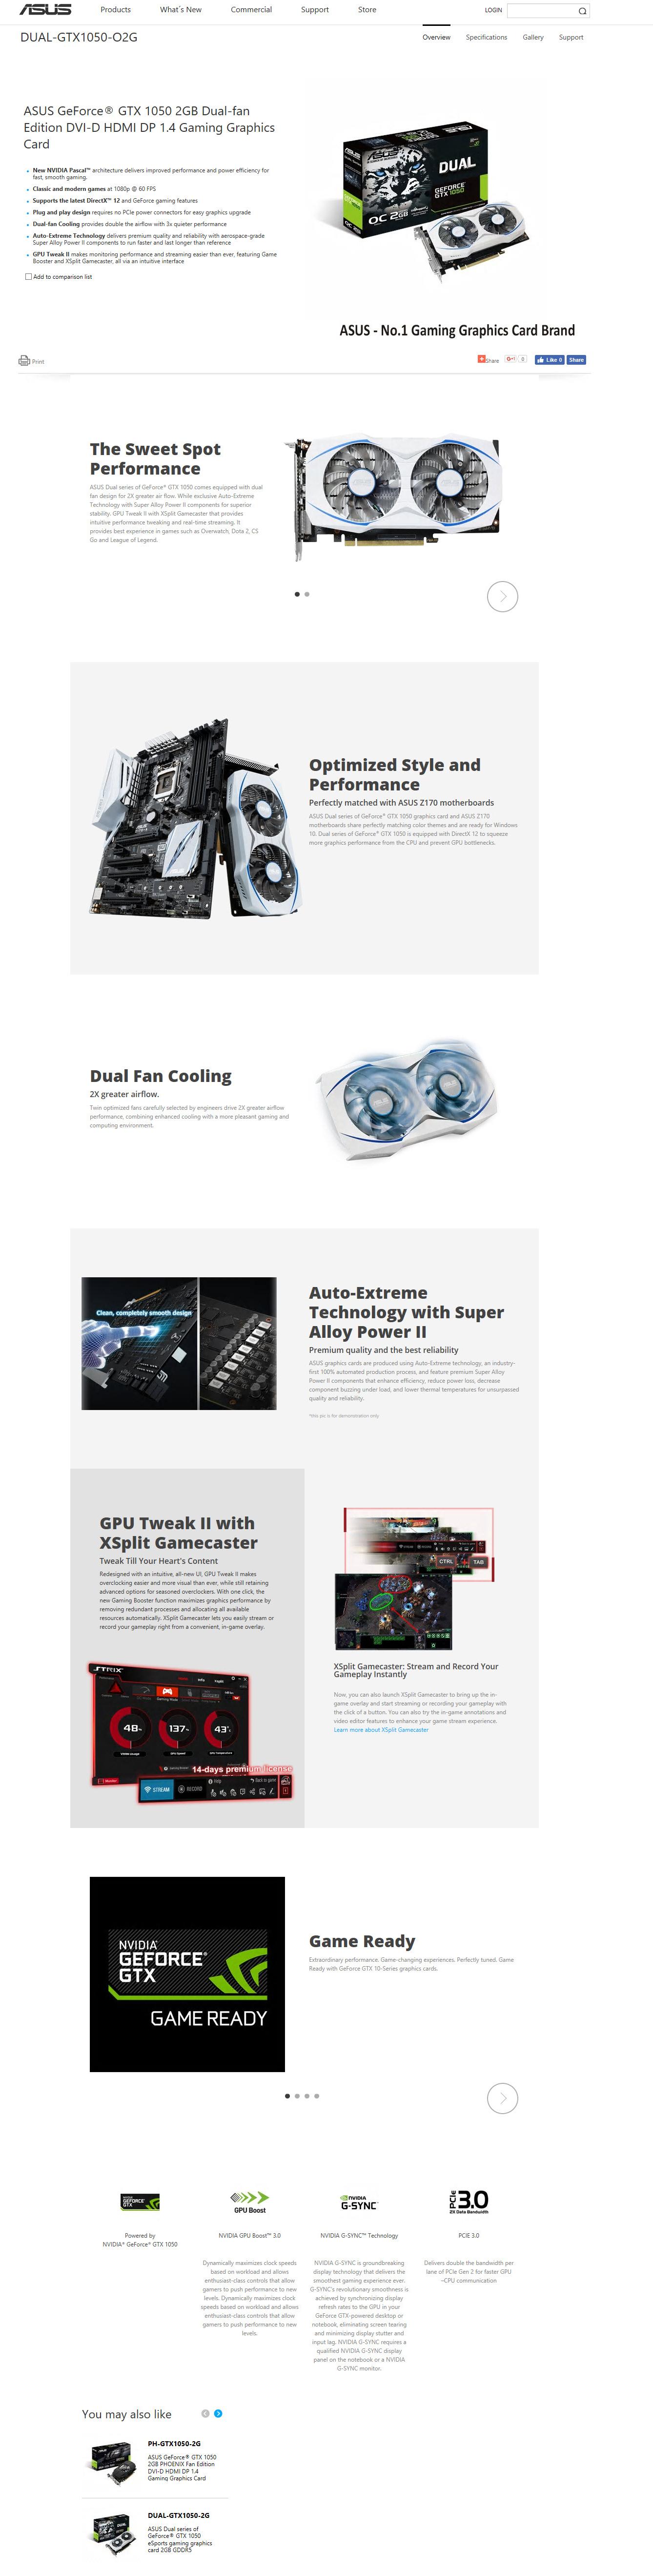 spec ASUS GeForce GTX 1050 2GB Dual fan Edition Review